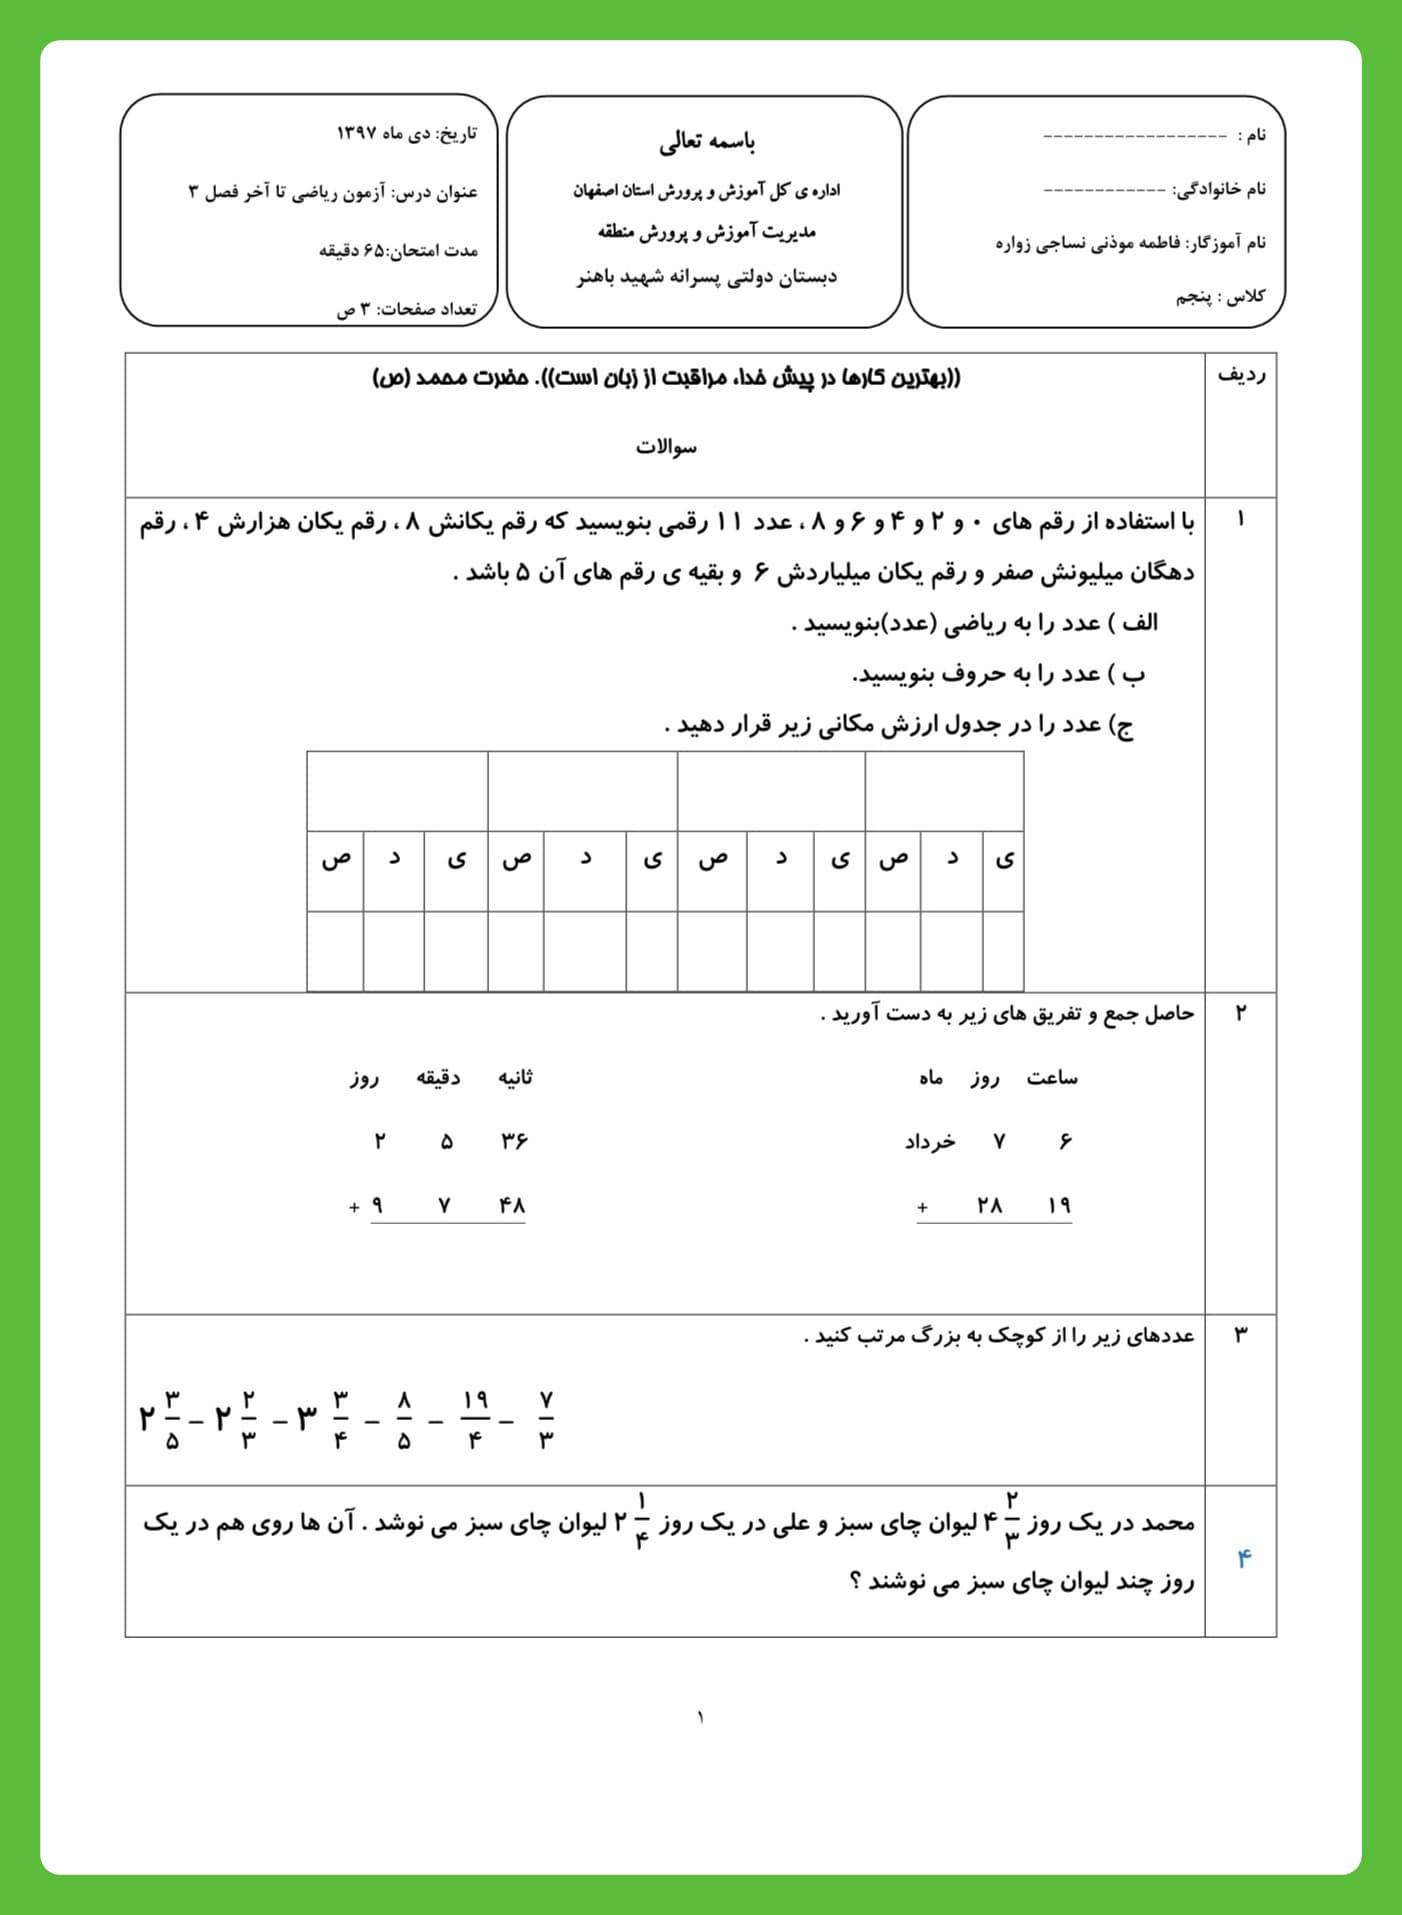 نمونه سوال ریاضی پنجم ترم اول با جواب